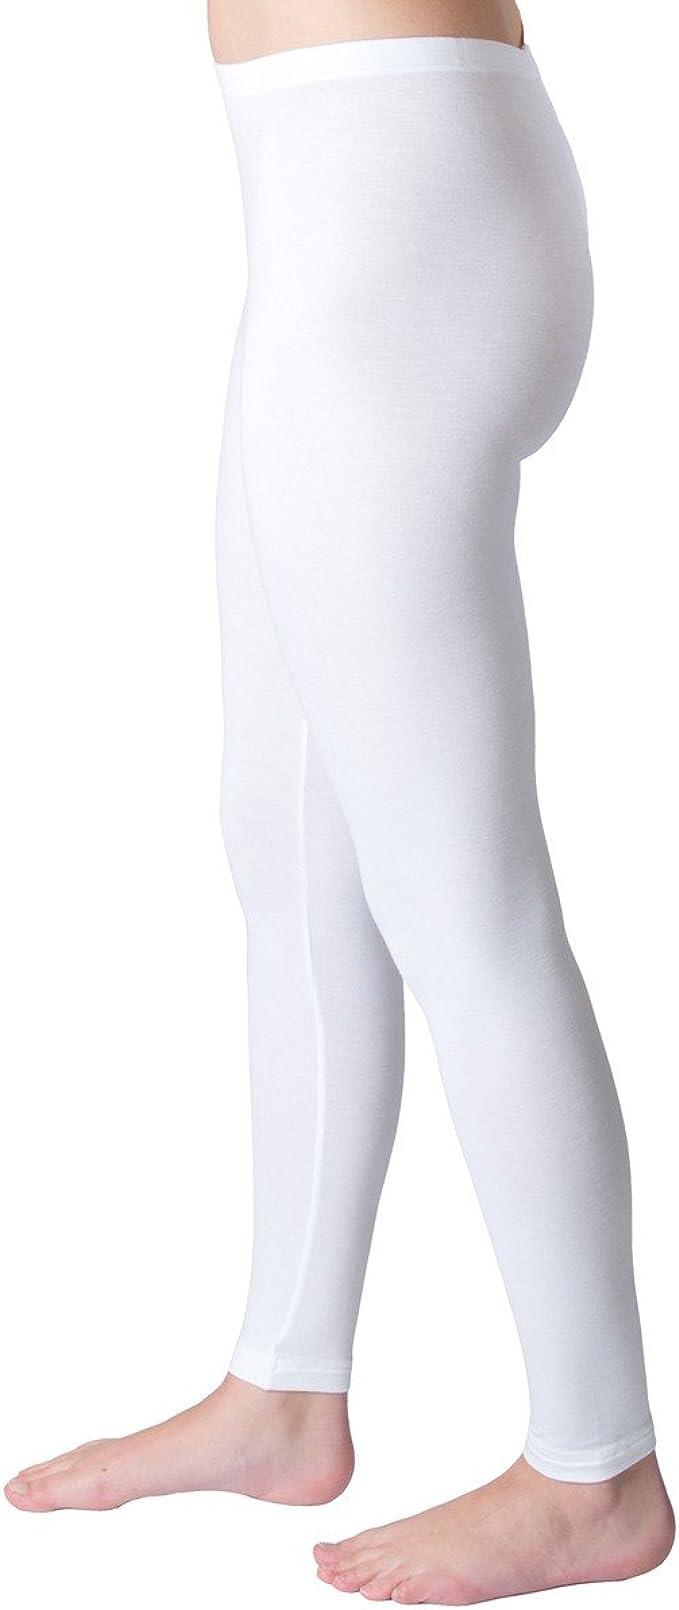 HERMKO 1720 Leggings de Mujer 100% algodón orgánico ...